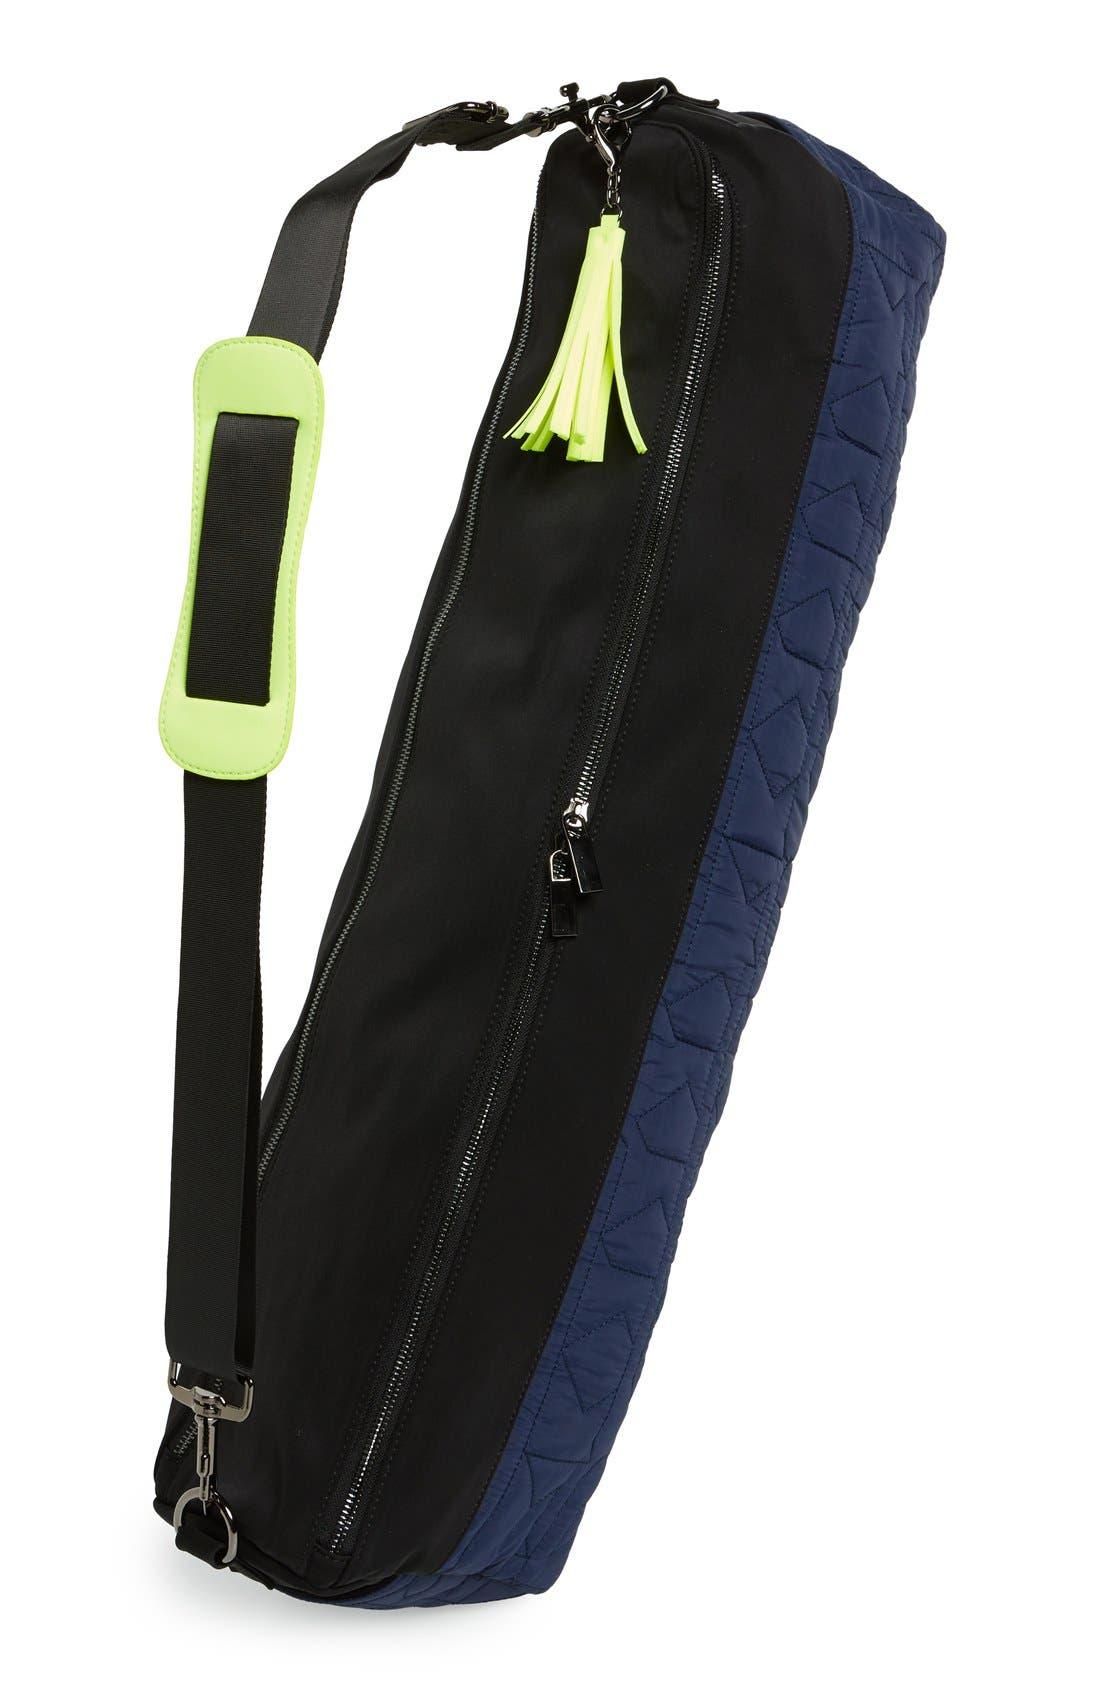 DL Activ 'Sunrise' Yoga Bag